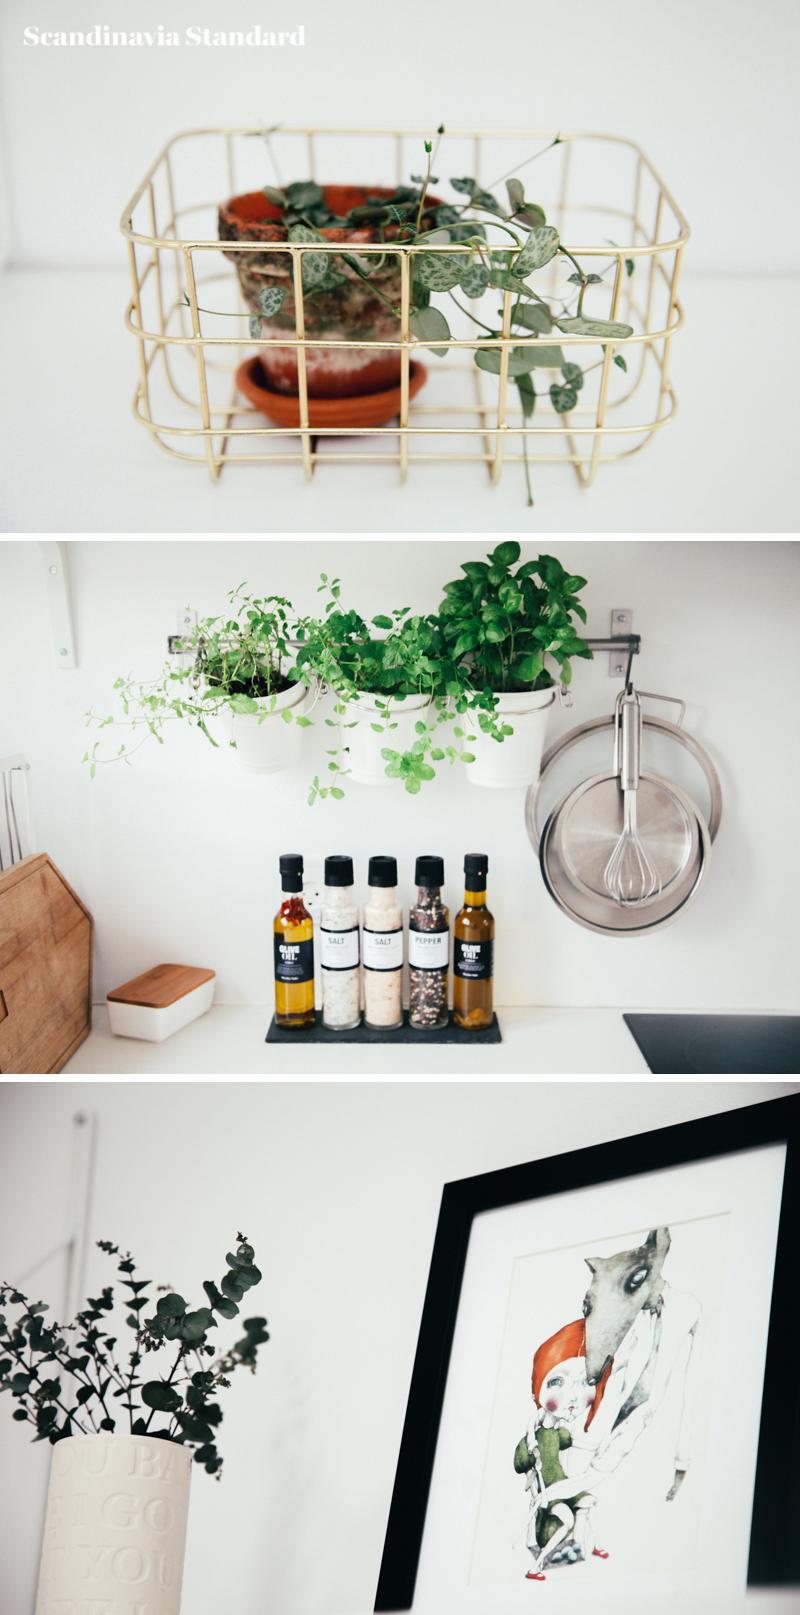 The White Room - Christina & Ulrich's Østerbro Apartment - Interiors - Collage 3 | Scandinavia Standard